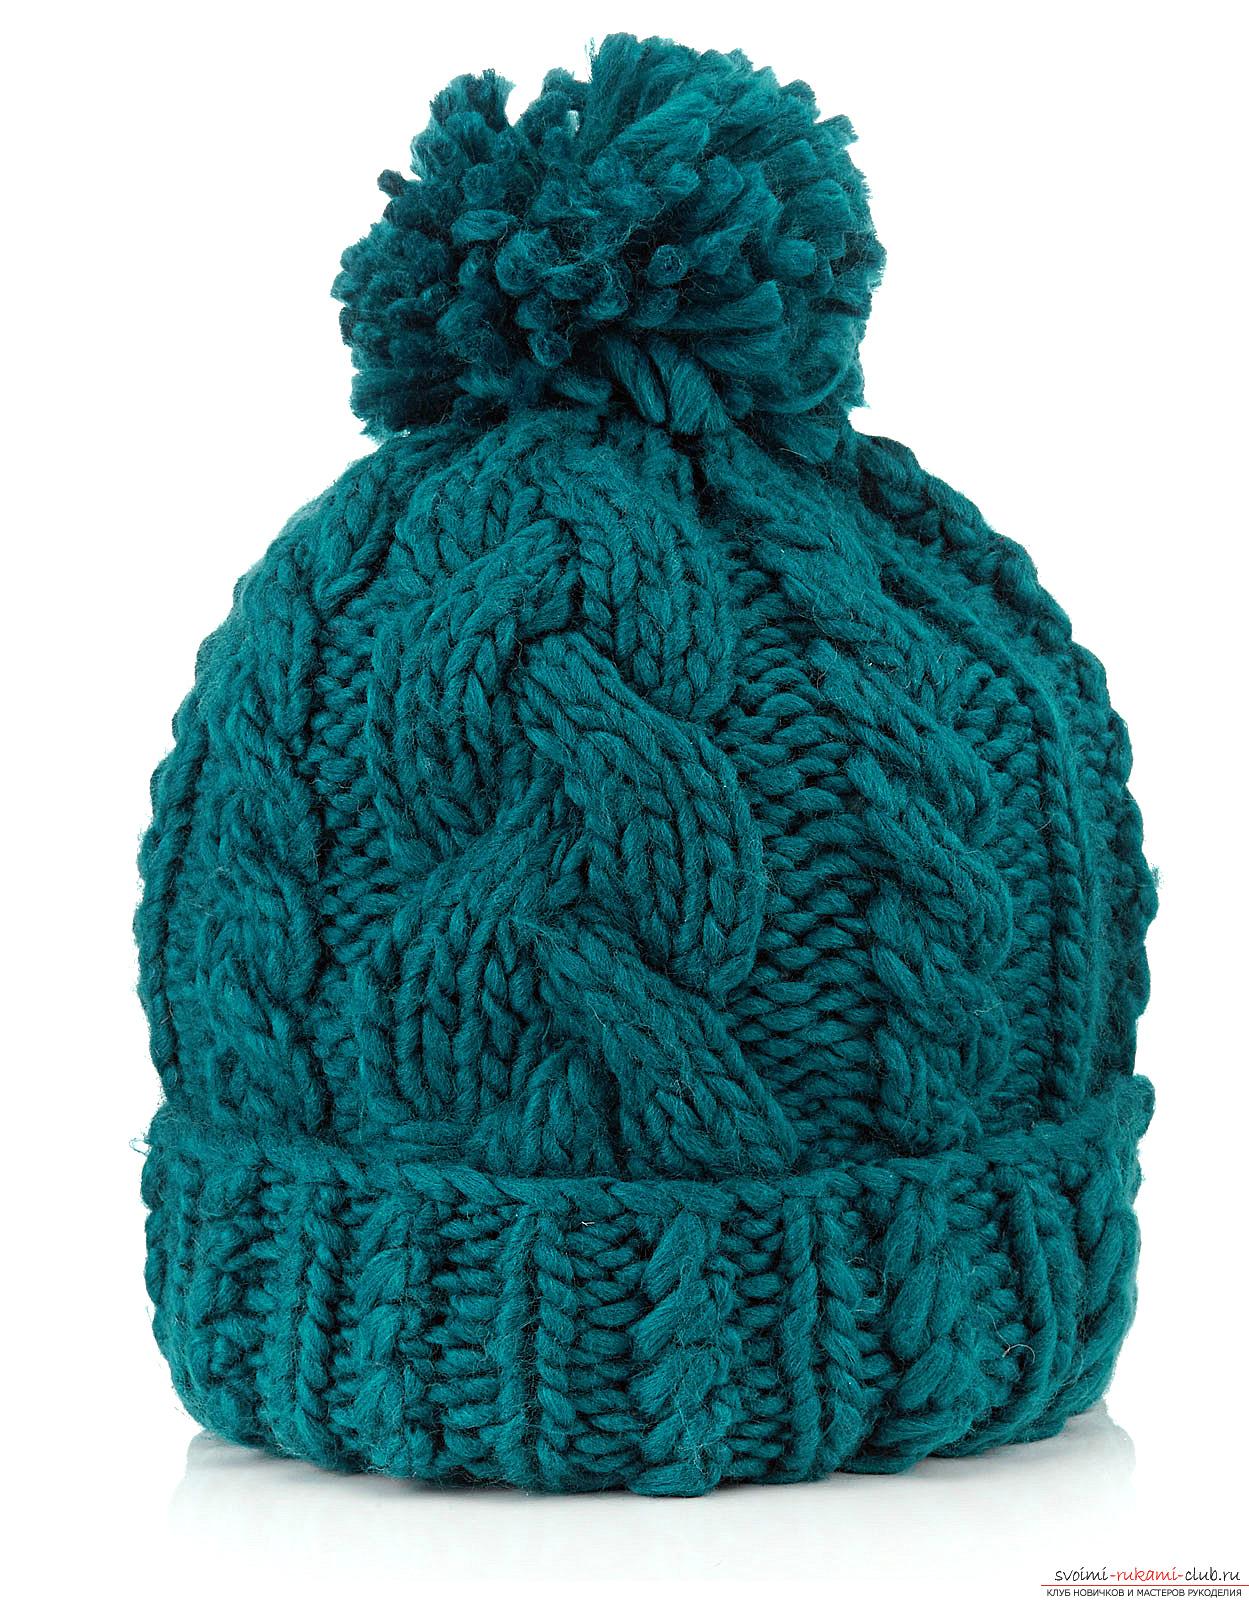 вязаная спицами шапка с отворотом. Фото №2